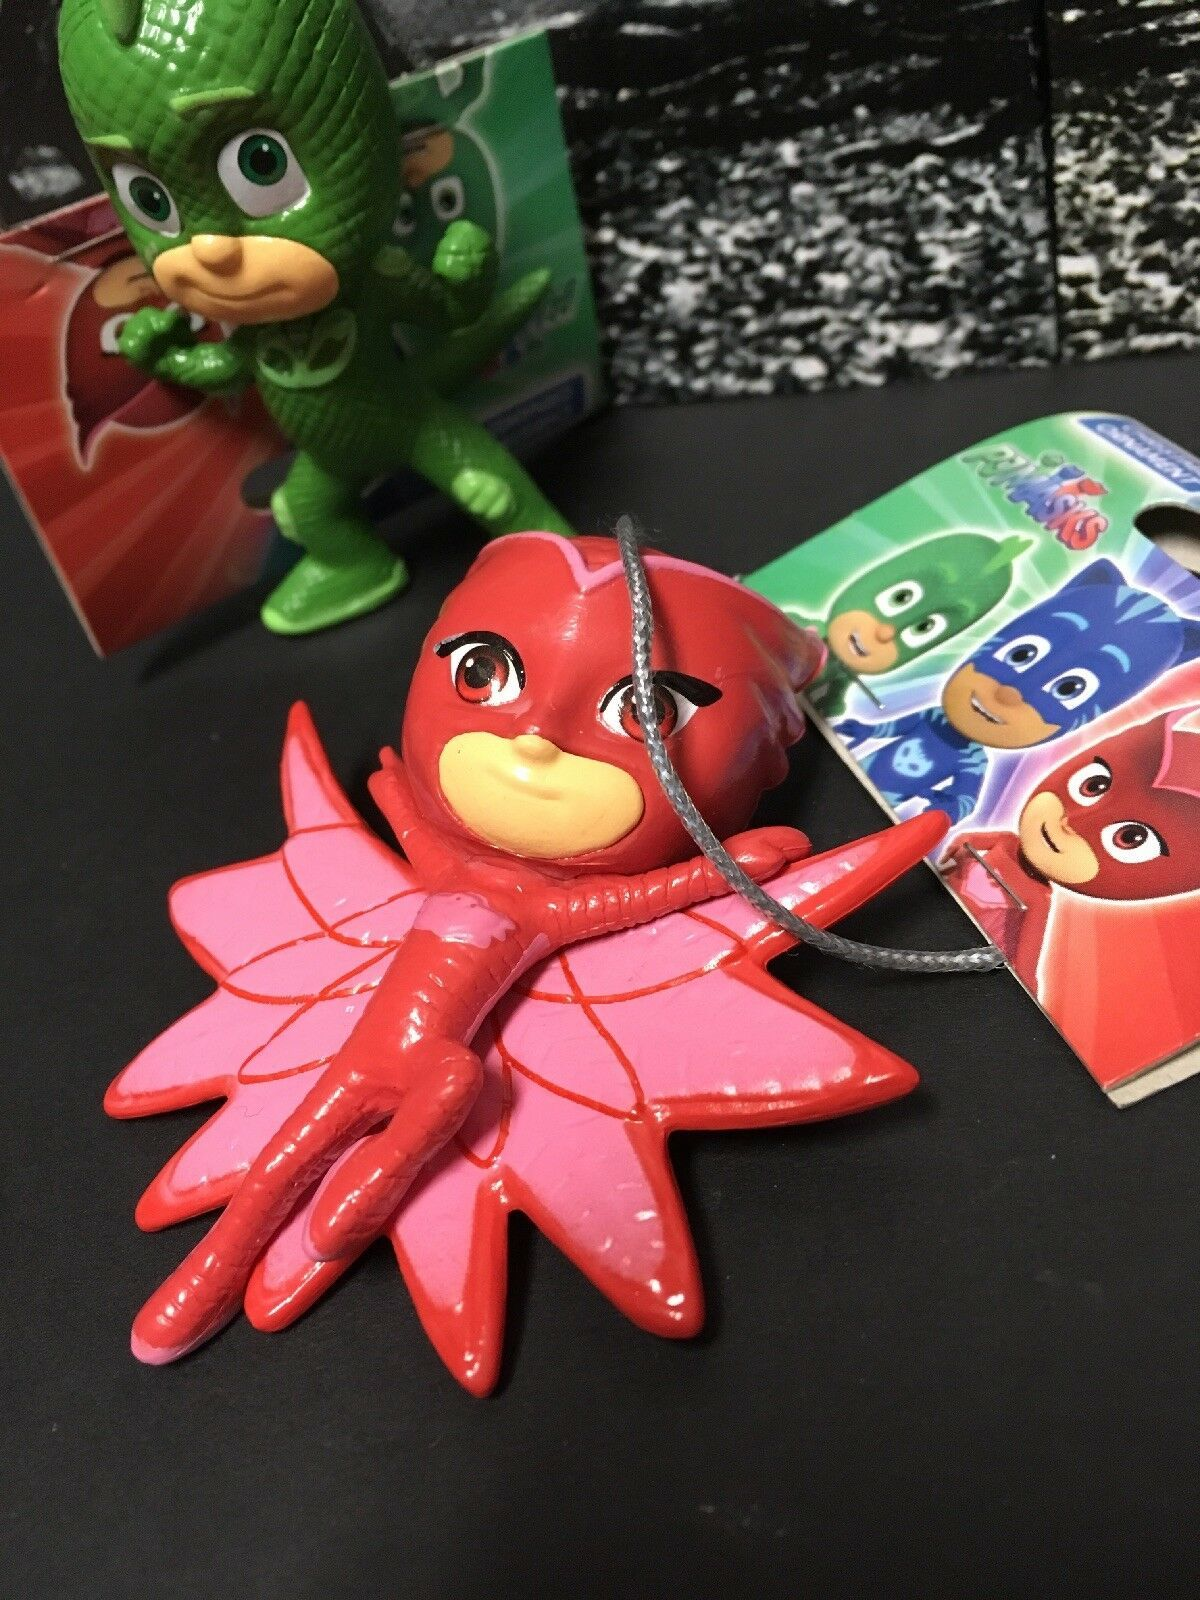 New PJ MASKS Christmas Ornaments Set of 3 Owlette Gekko Catboy by Kurt Adler